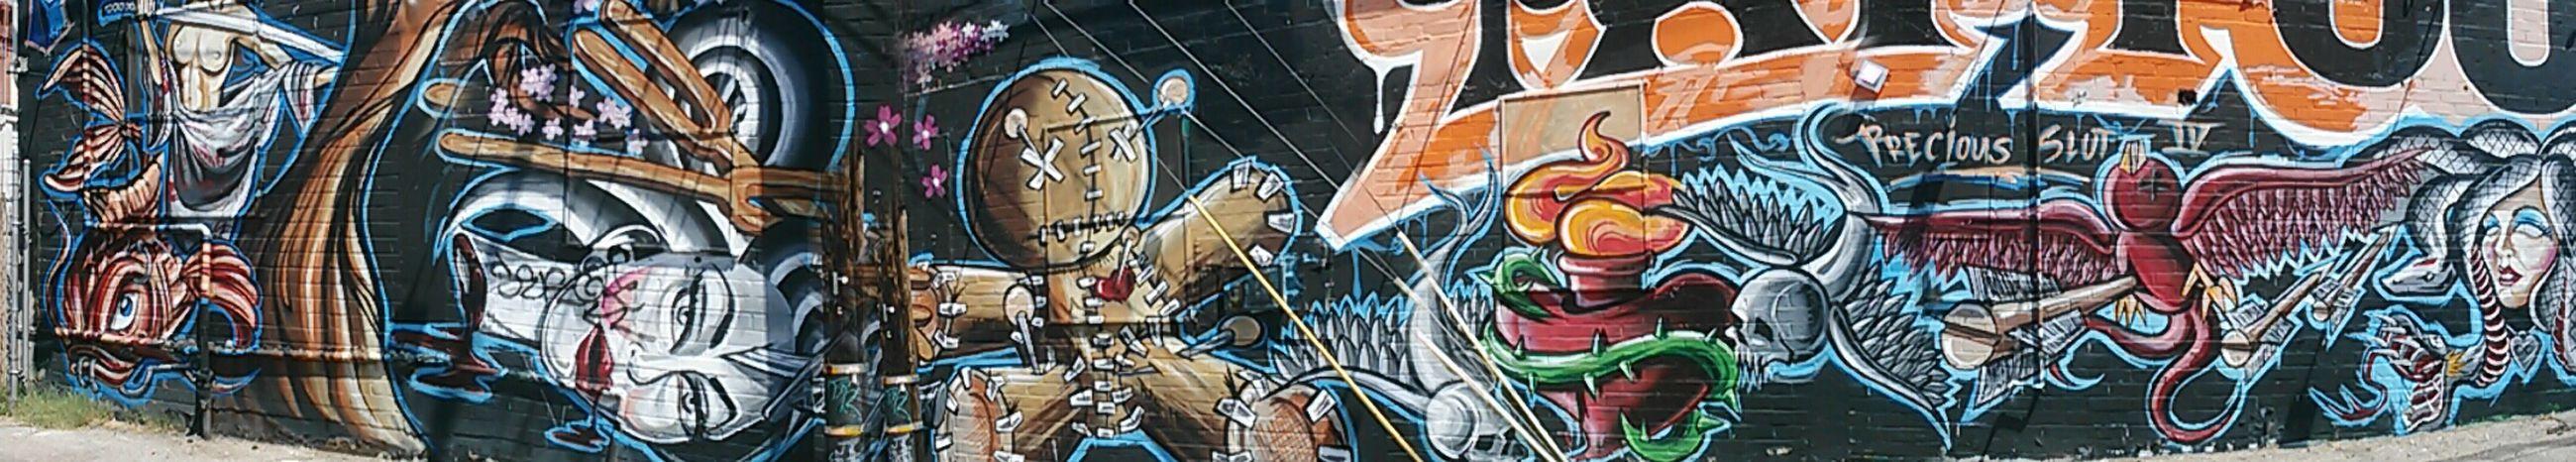 Tattoshop ArtWork Graffiti Las Vegas